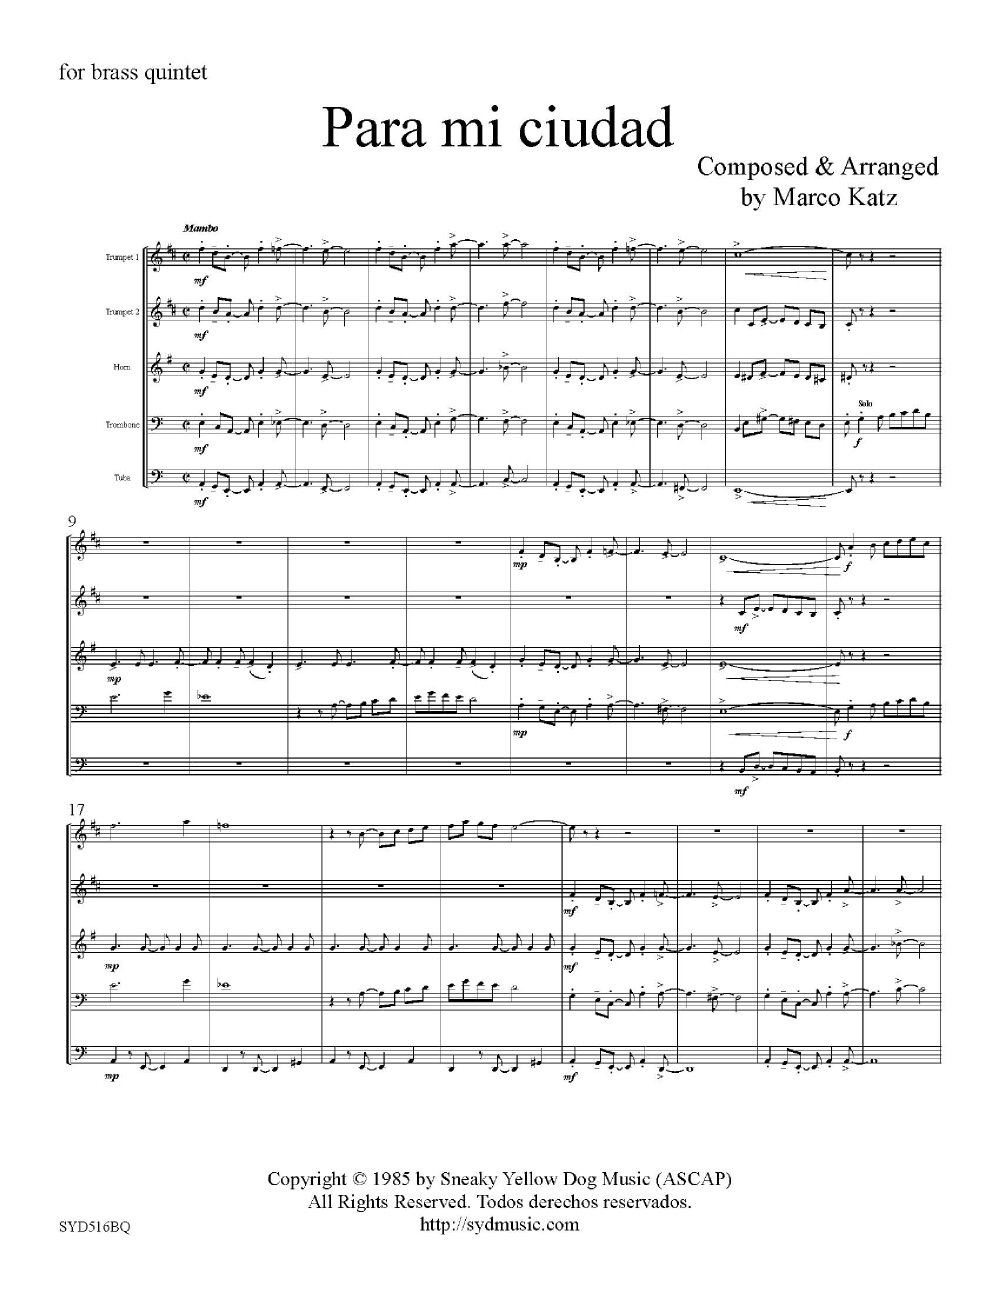 Para Mi Ciudad-Brass Quintet Thumbnail